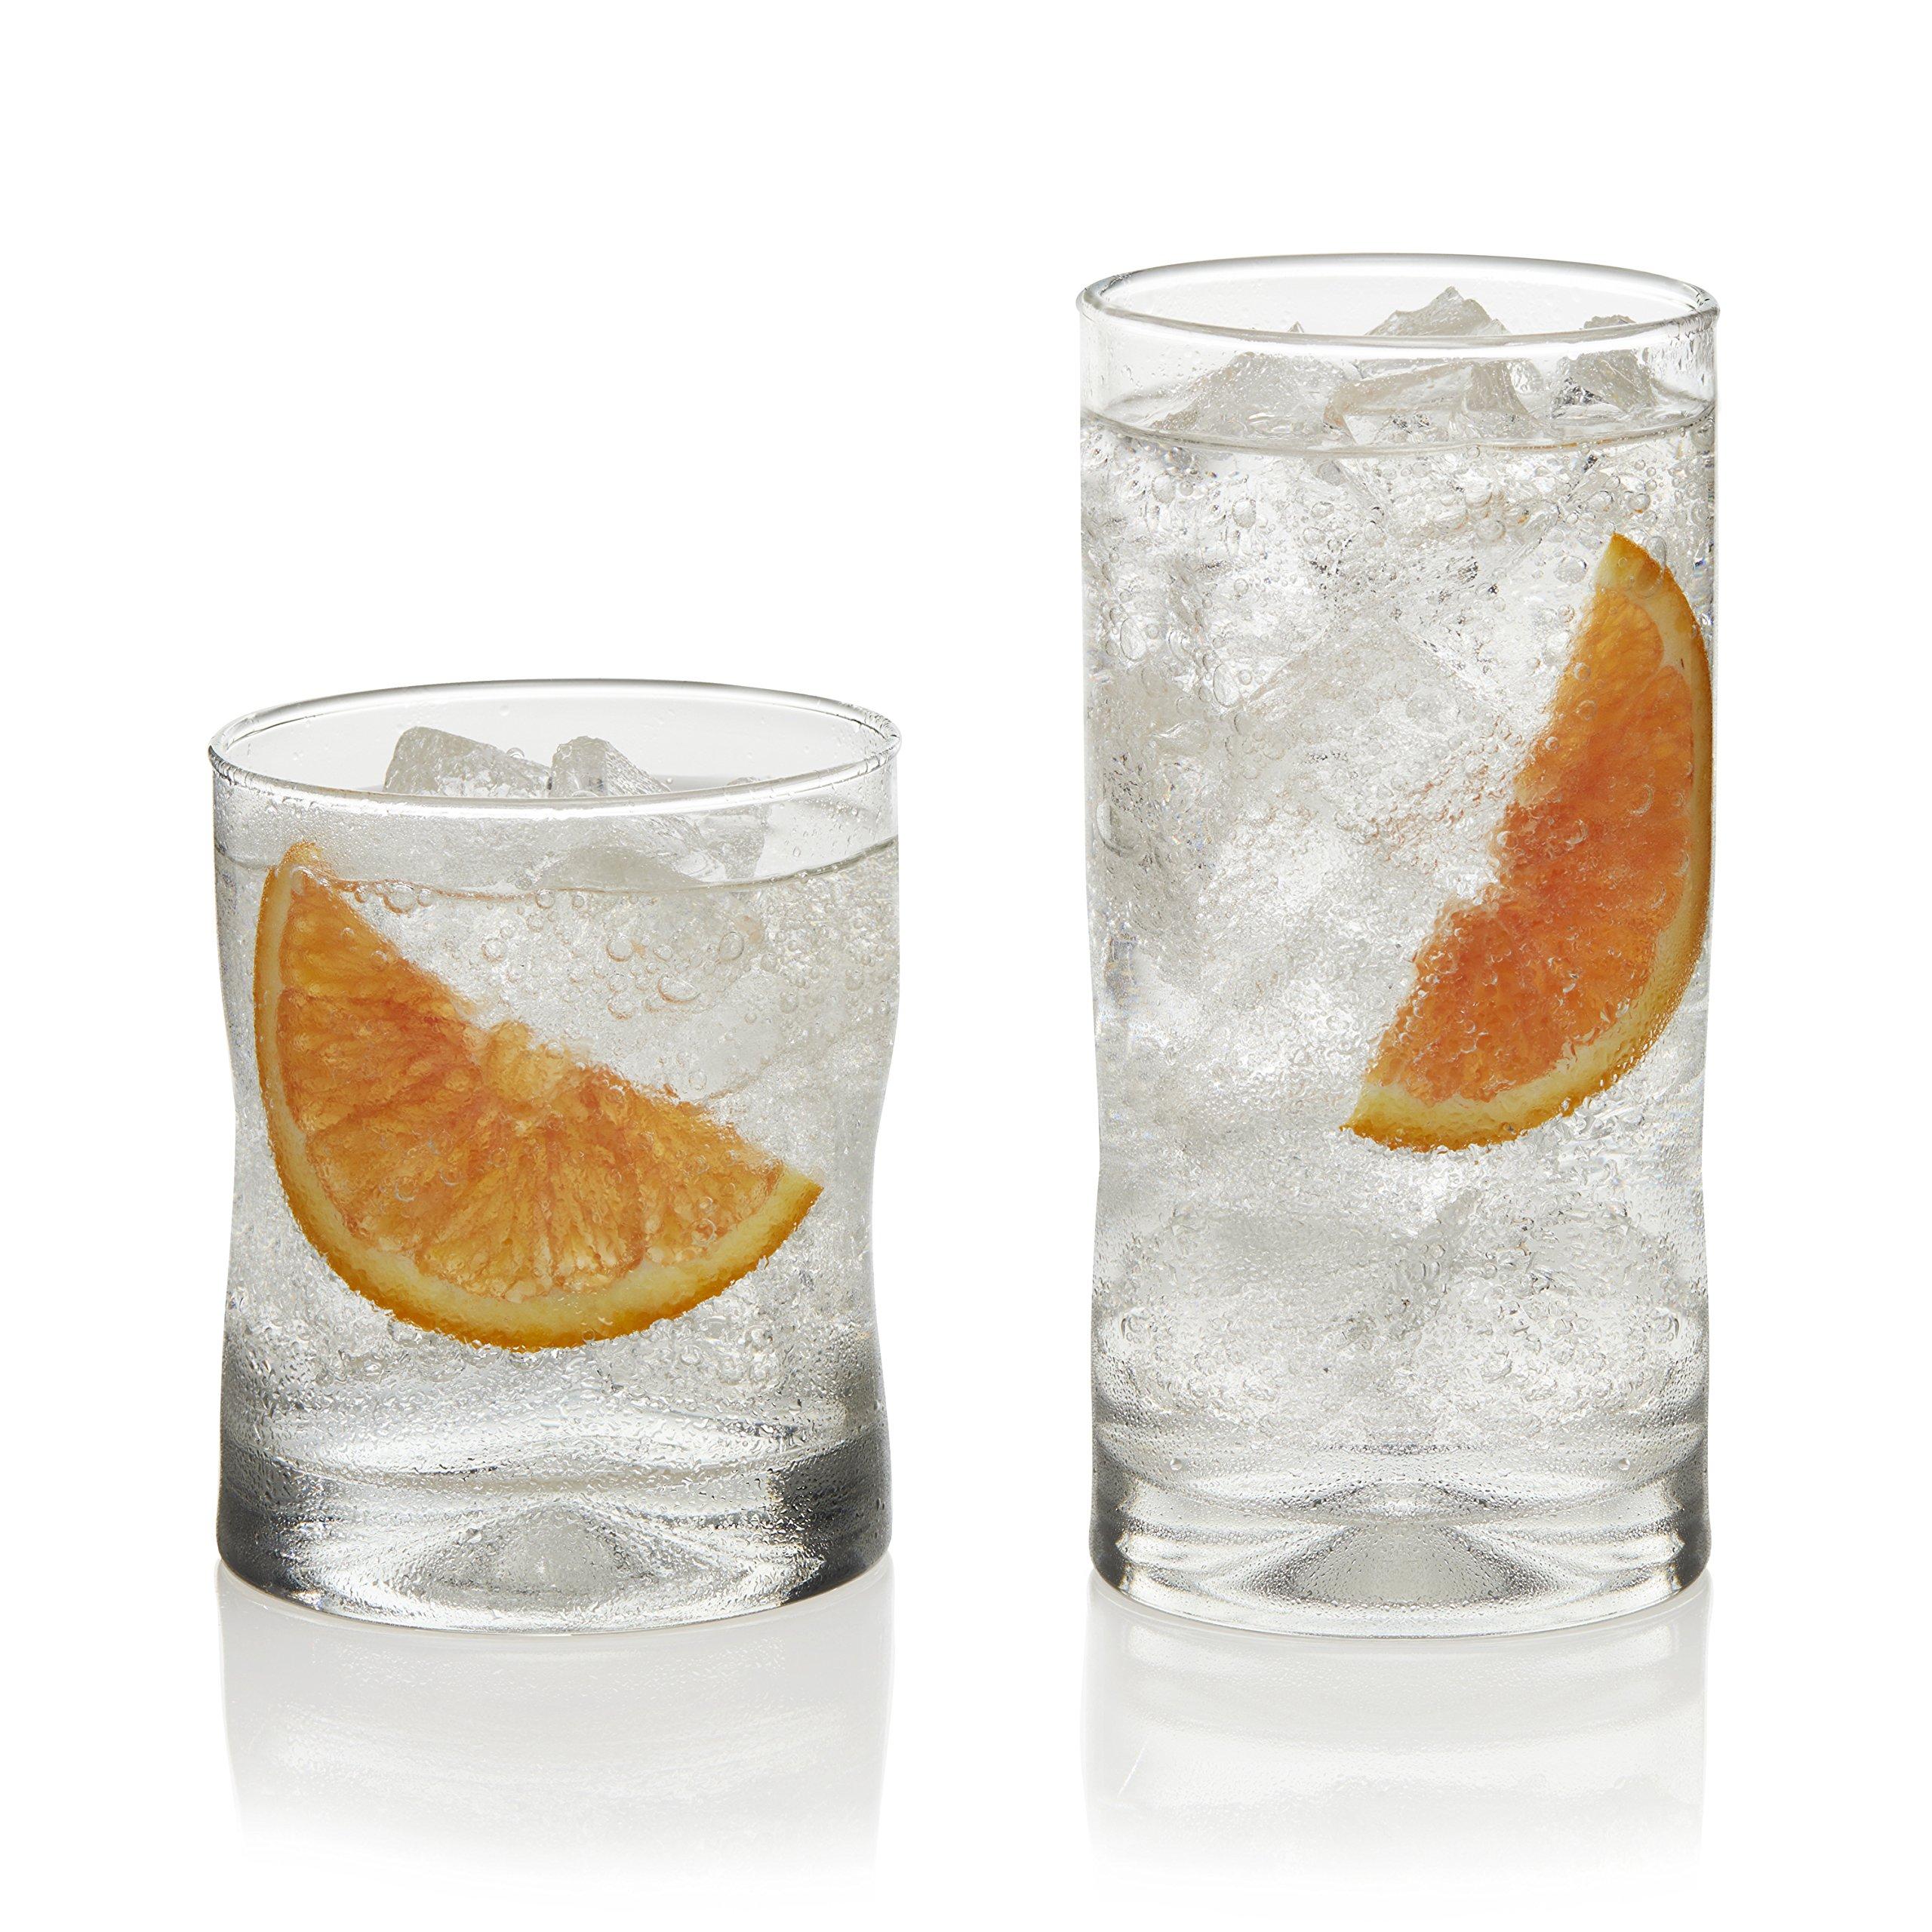 Libbey Impressions 16-piece Drinkware Glass Set